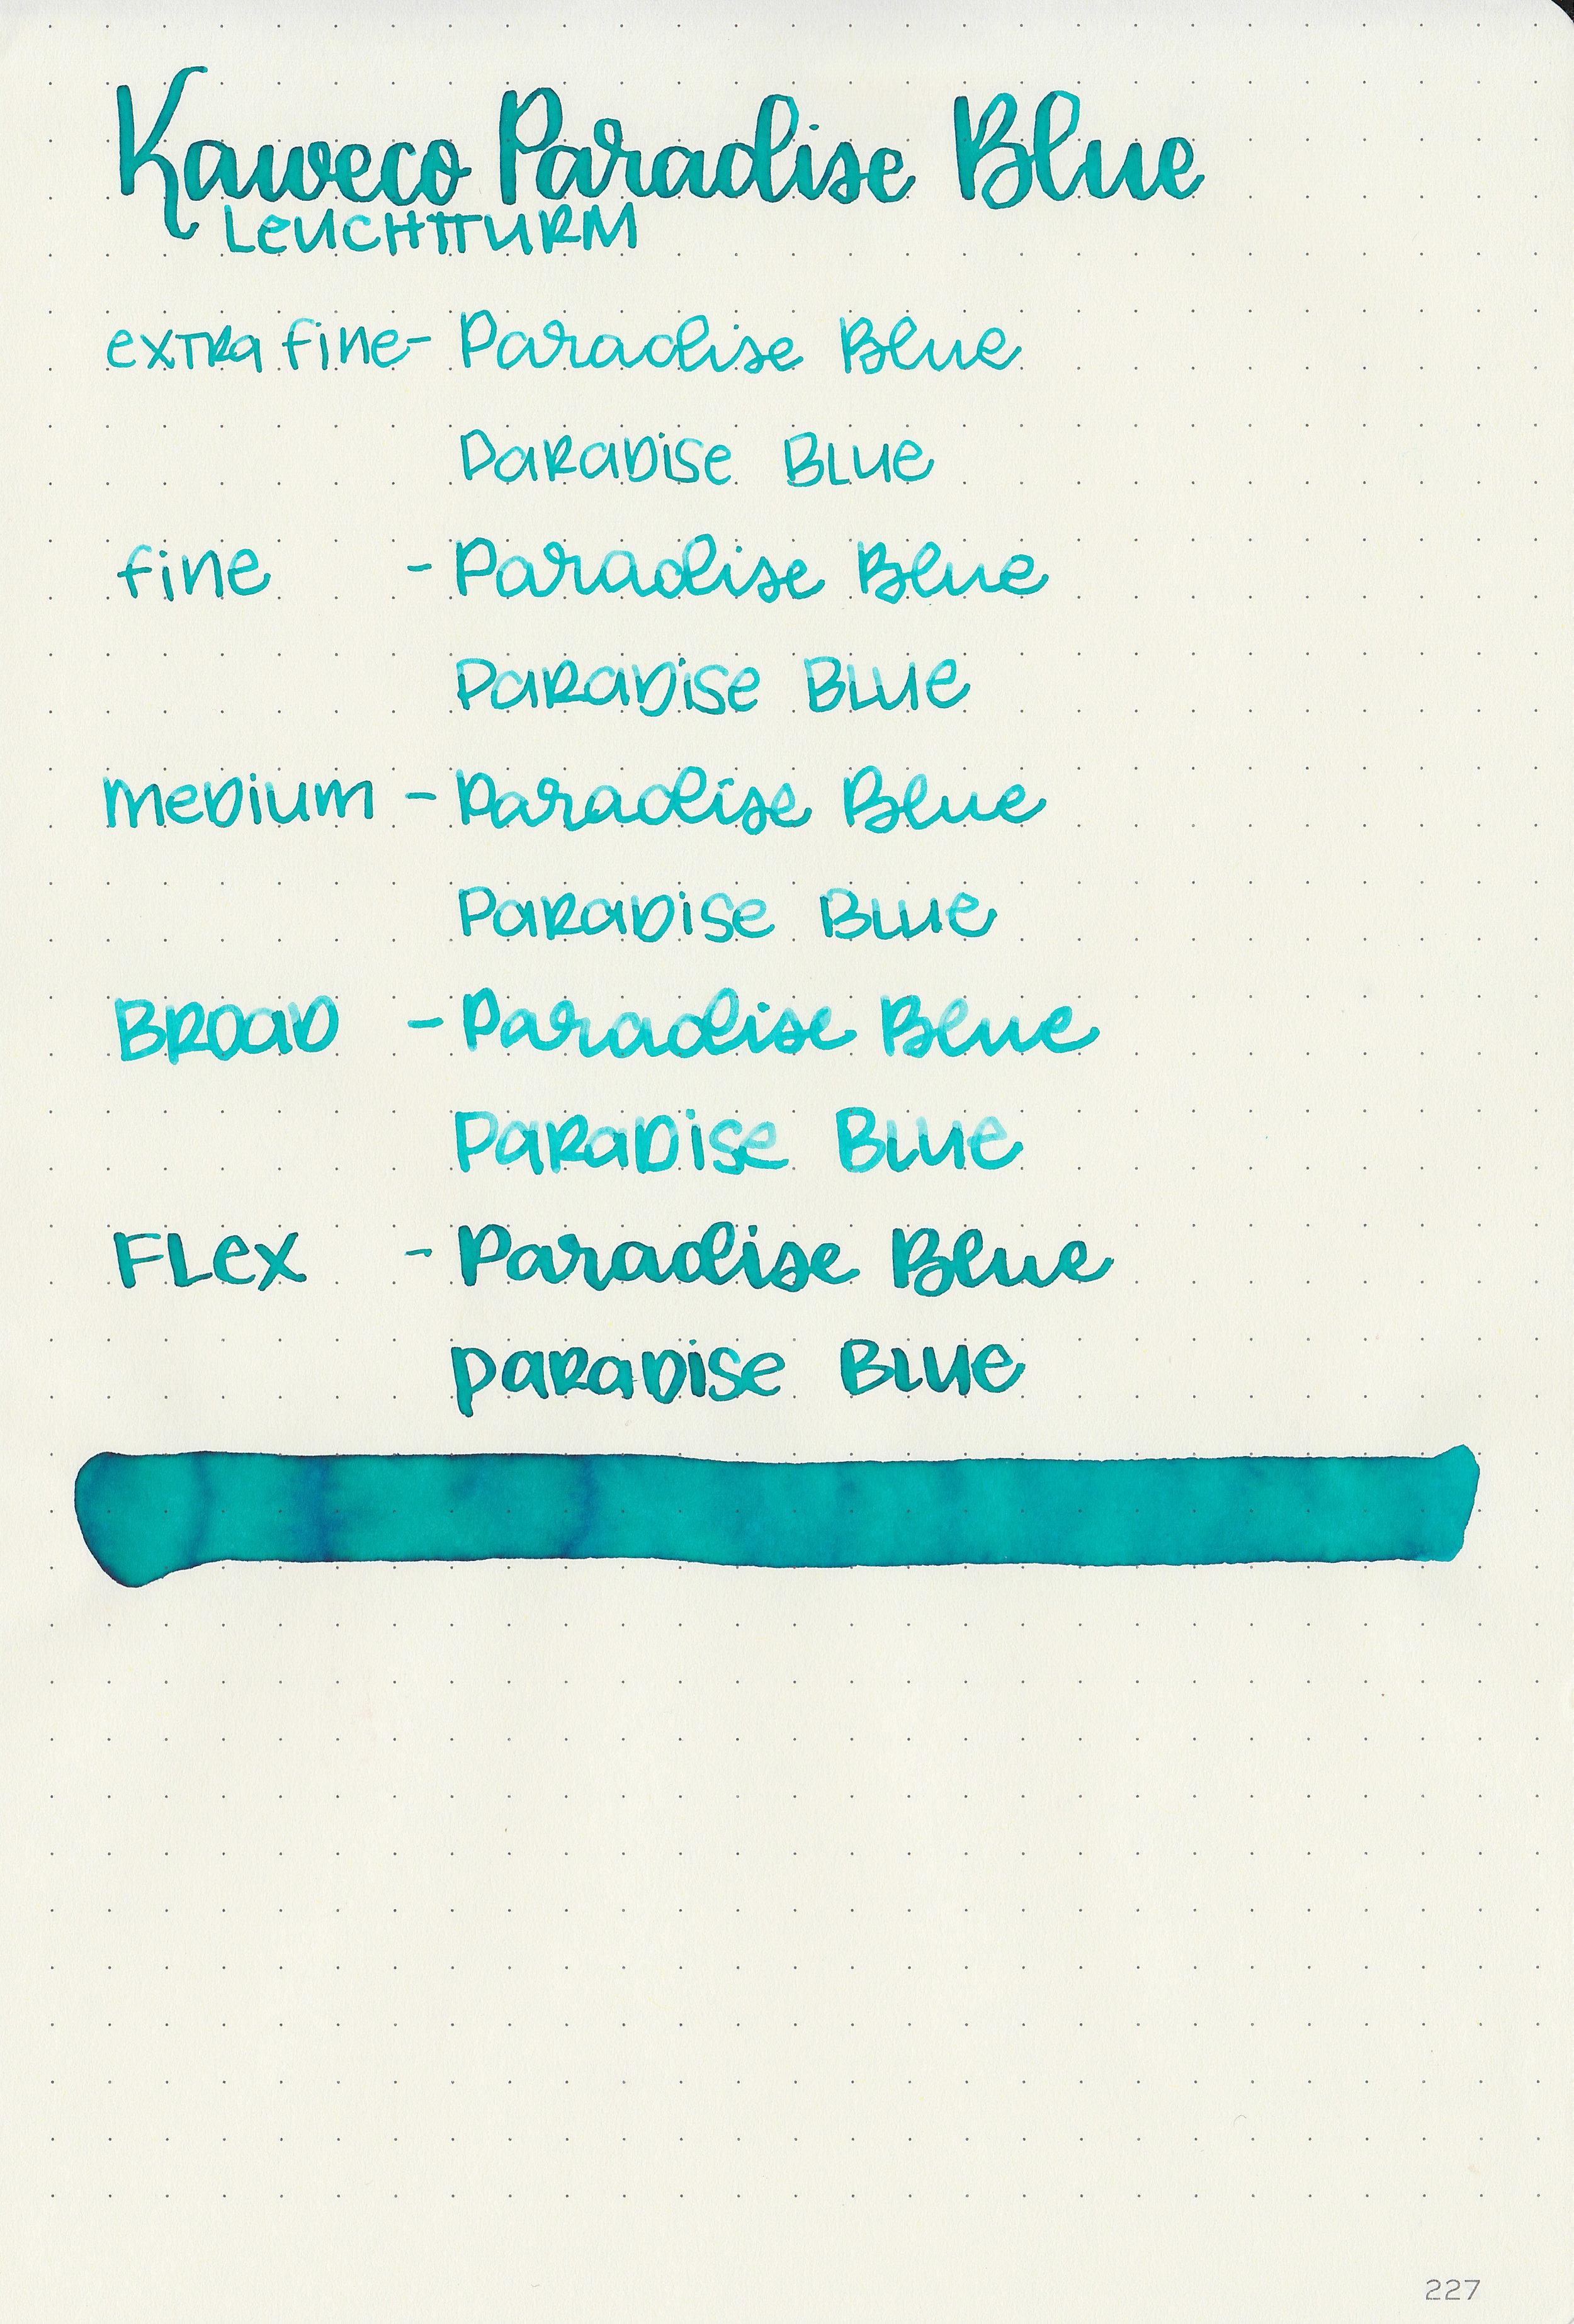 kw-paradise-blue-9.jpg